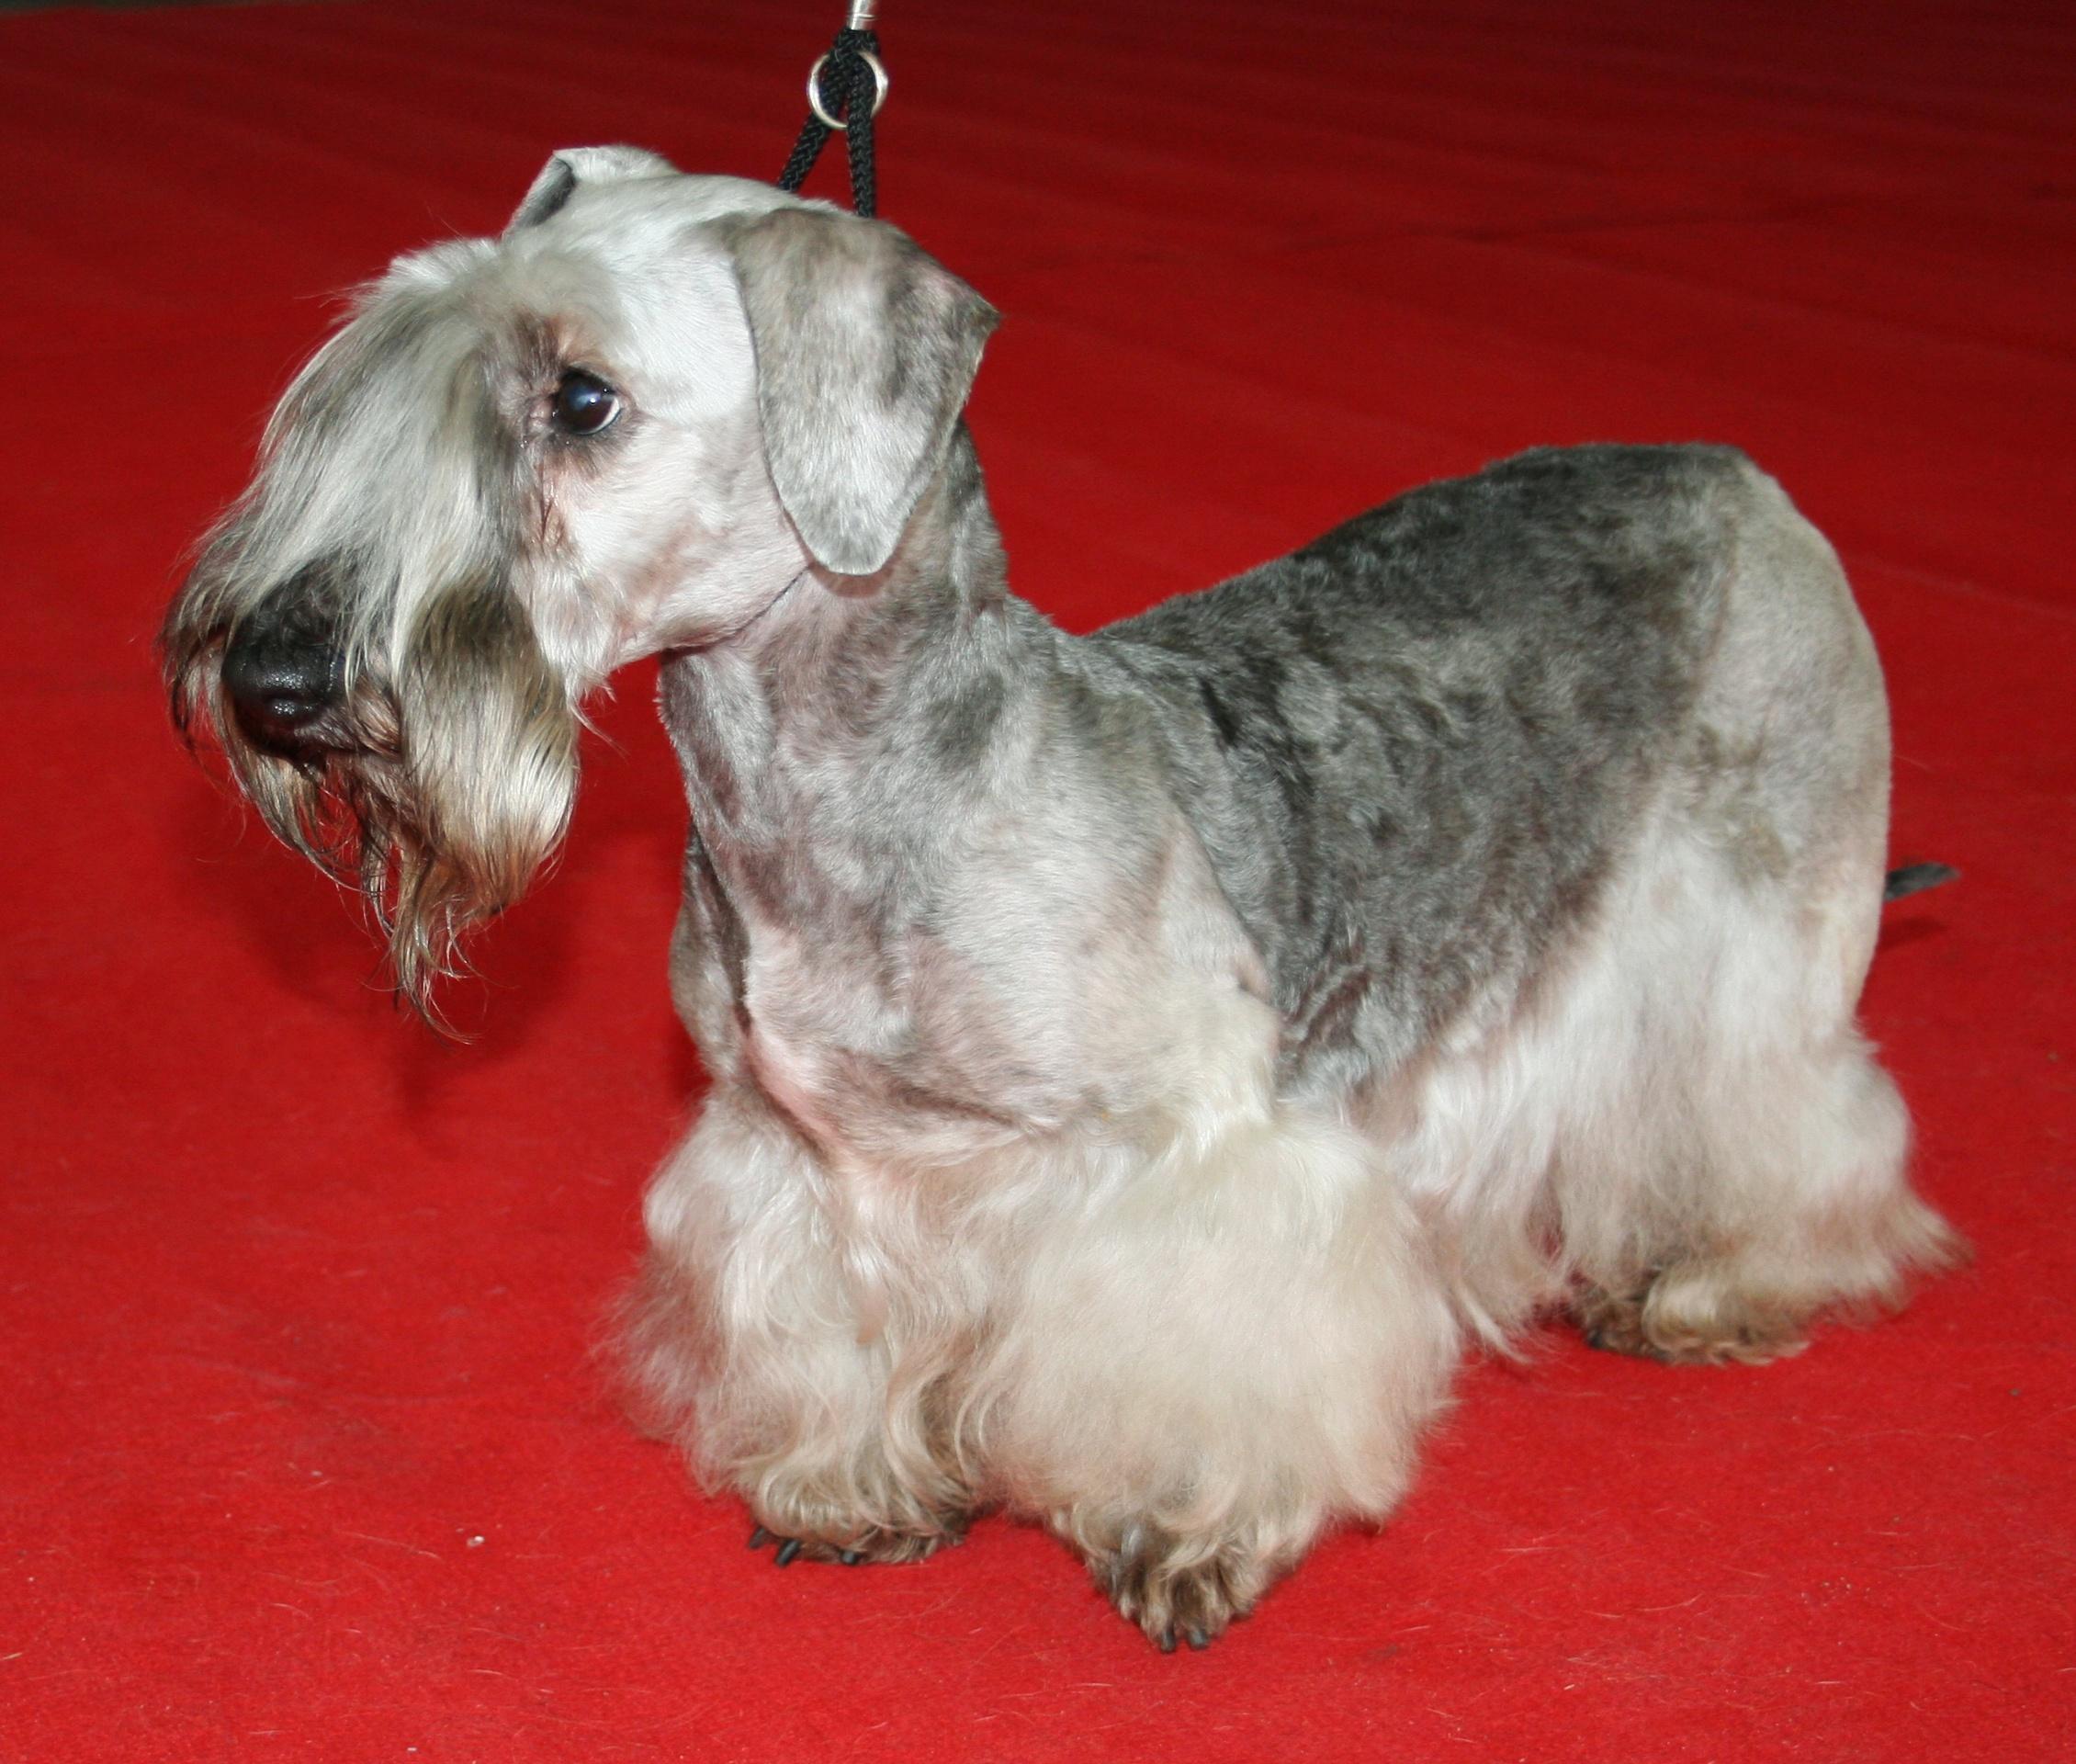 Cesky Terrier - Wikipedia